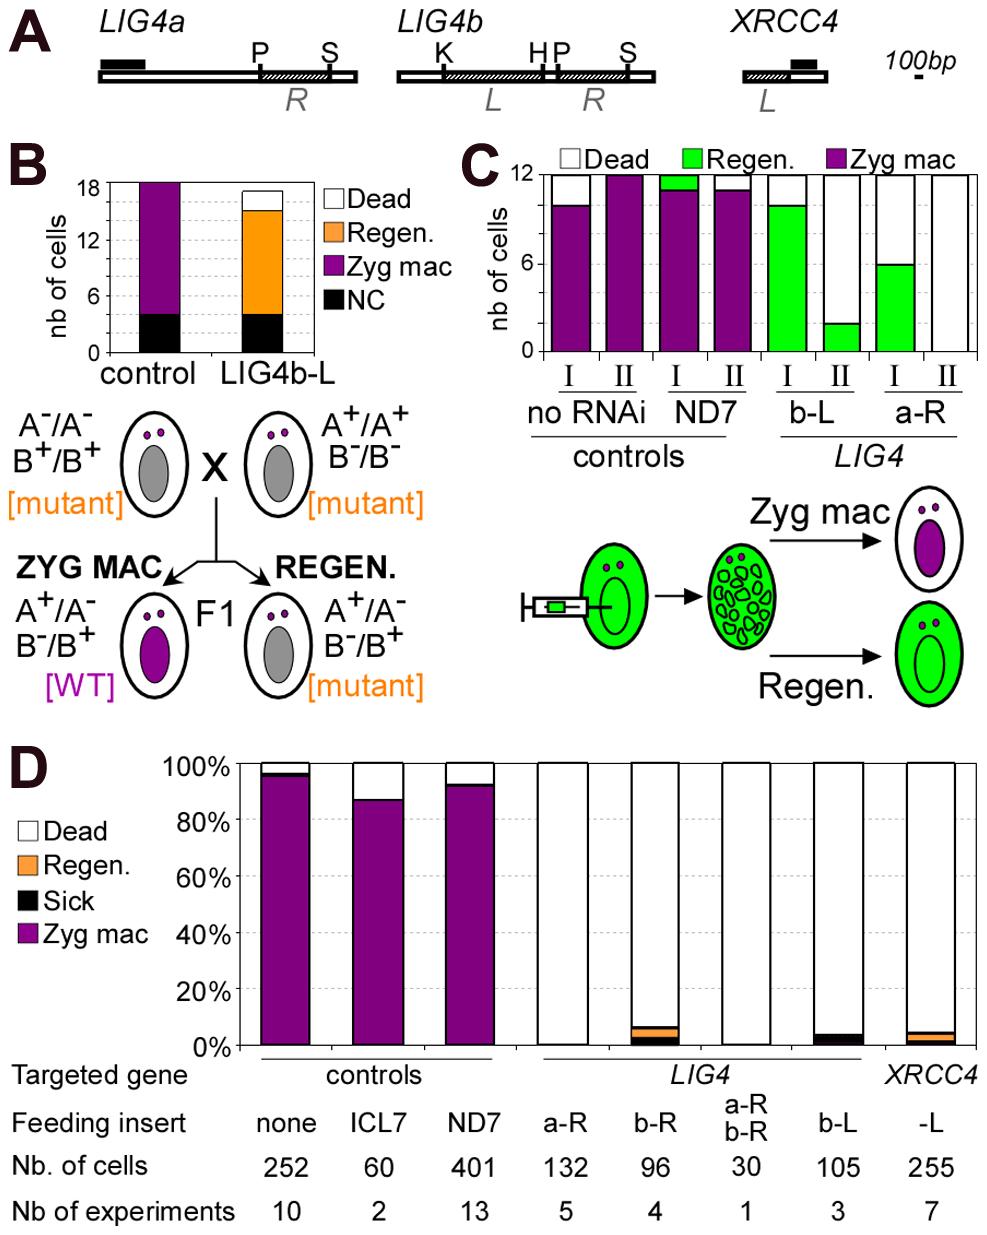 Analysis of sexual progeny of <i>LIG4</i>-silenced cells.